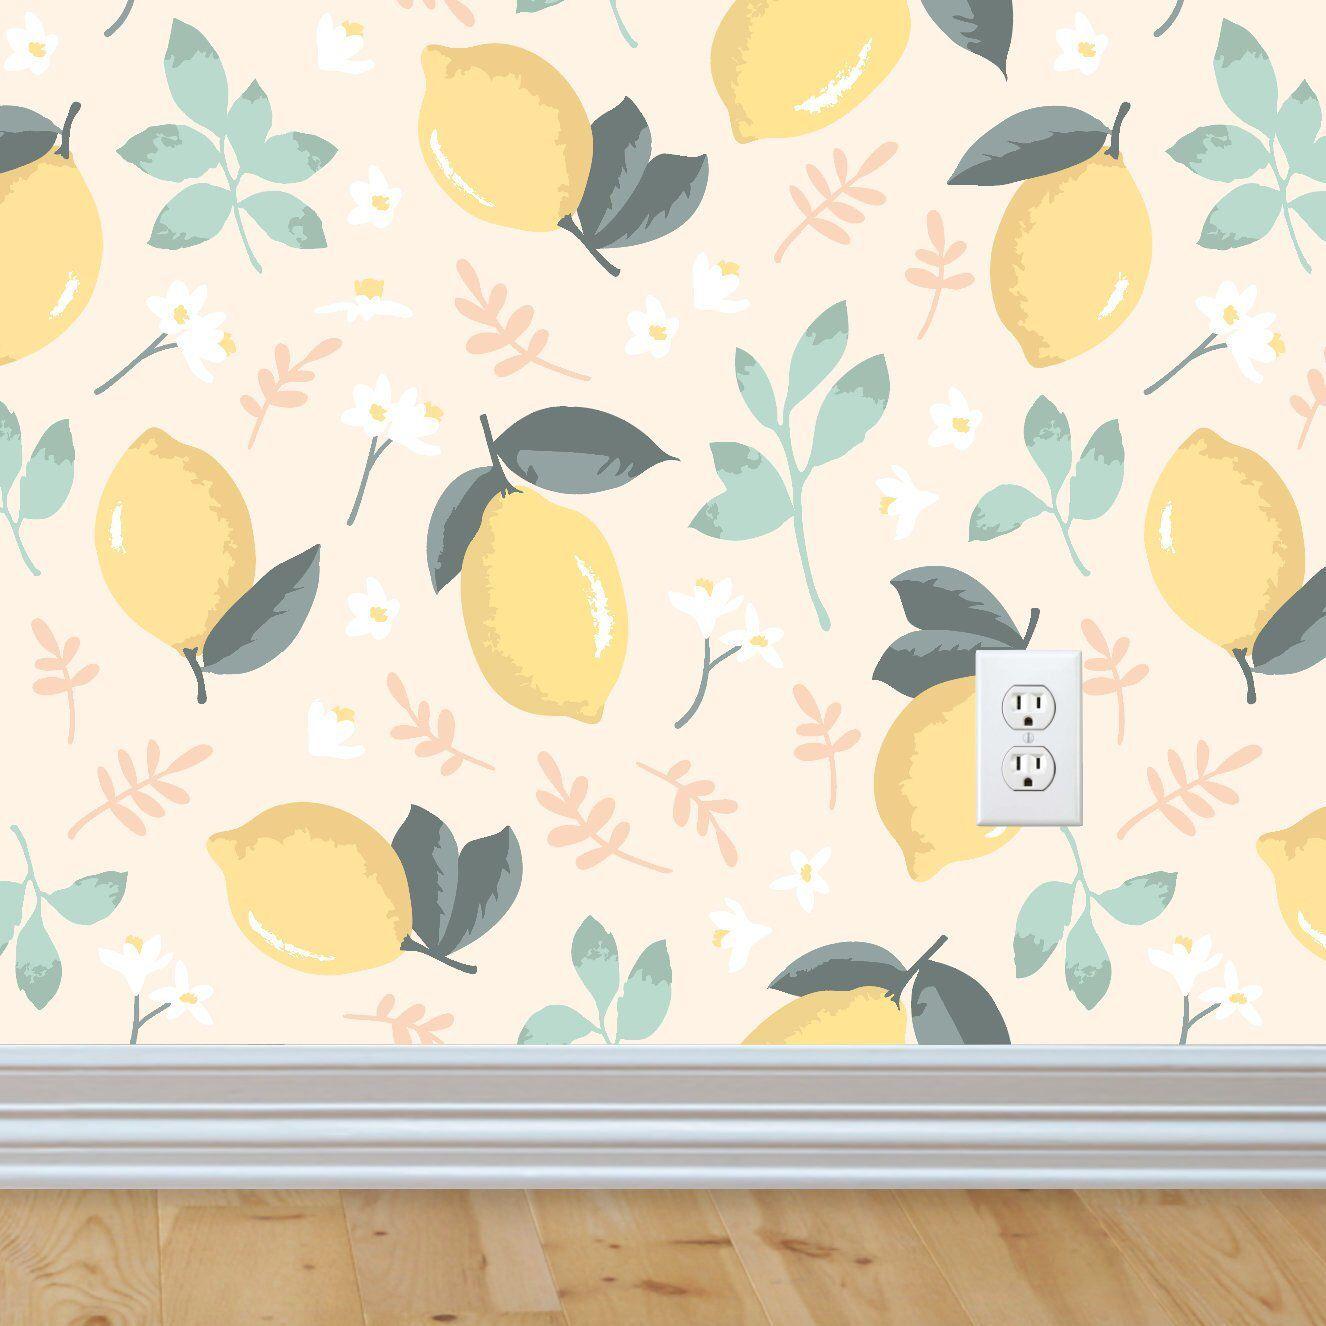 Lemon And Mint Wallpaper Peel And Stick Wallpaper Fruit Decor Removable Wallpaper Lemon Decor Yellow Green Decor Mint Wallpaper Lemon Decor Removable Wallpaper